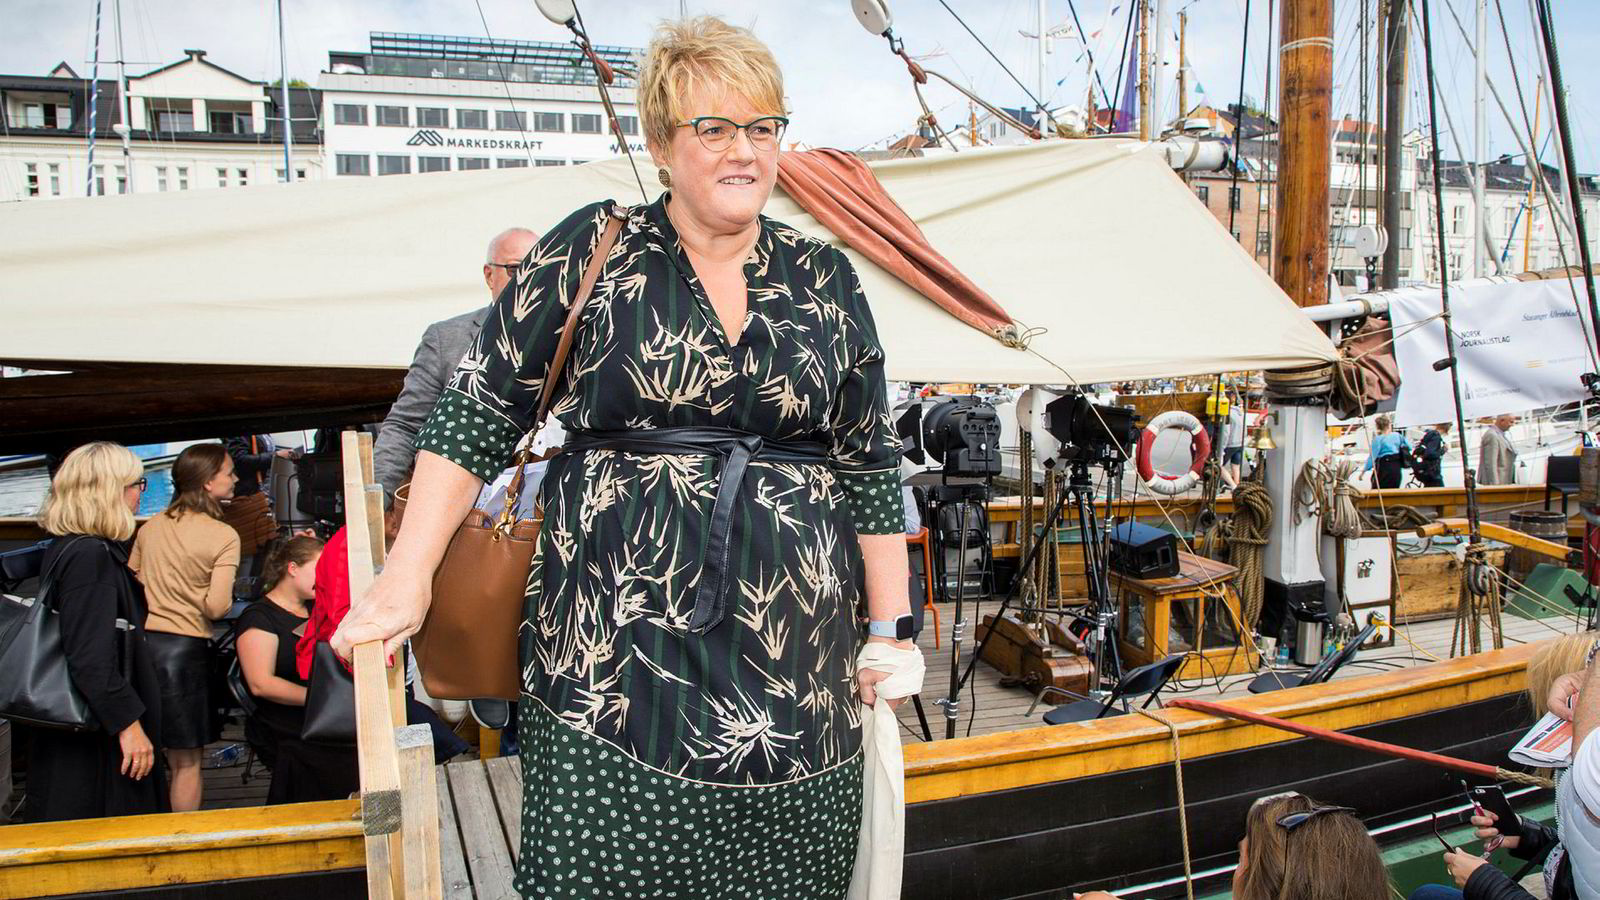 Kulturminister Trine Skei Grande forlater mediebåten etter en debatt underArendalsuka.